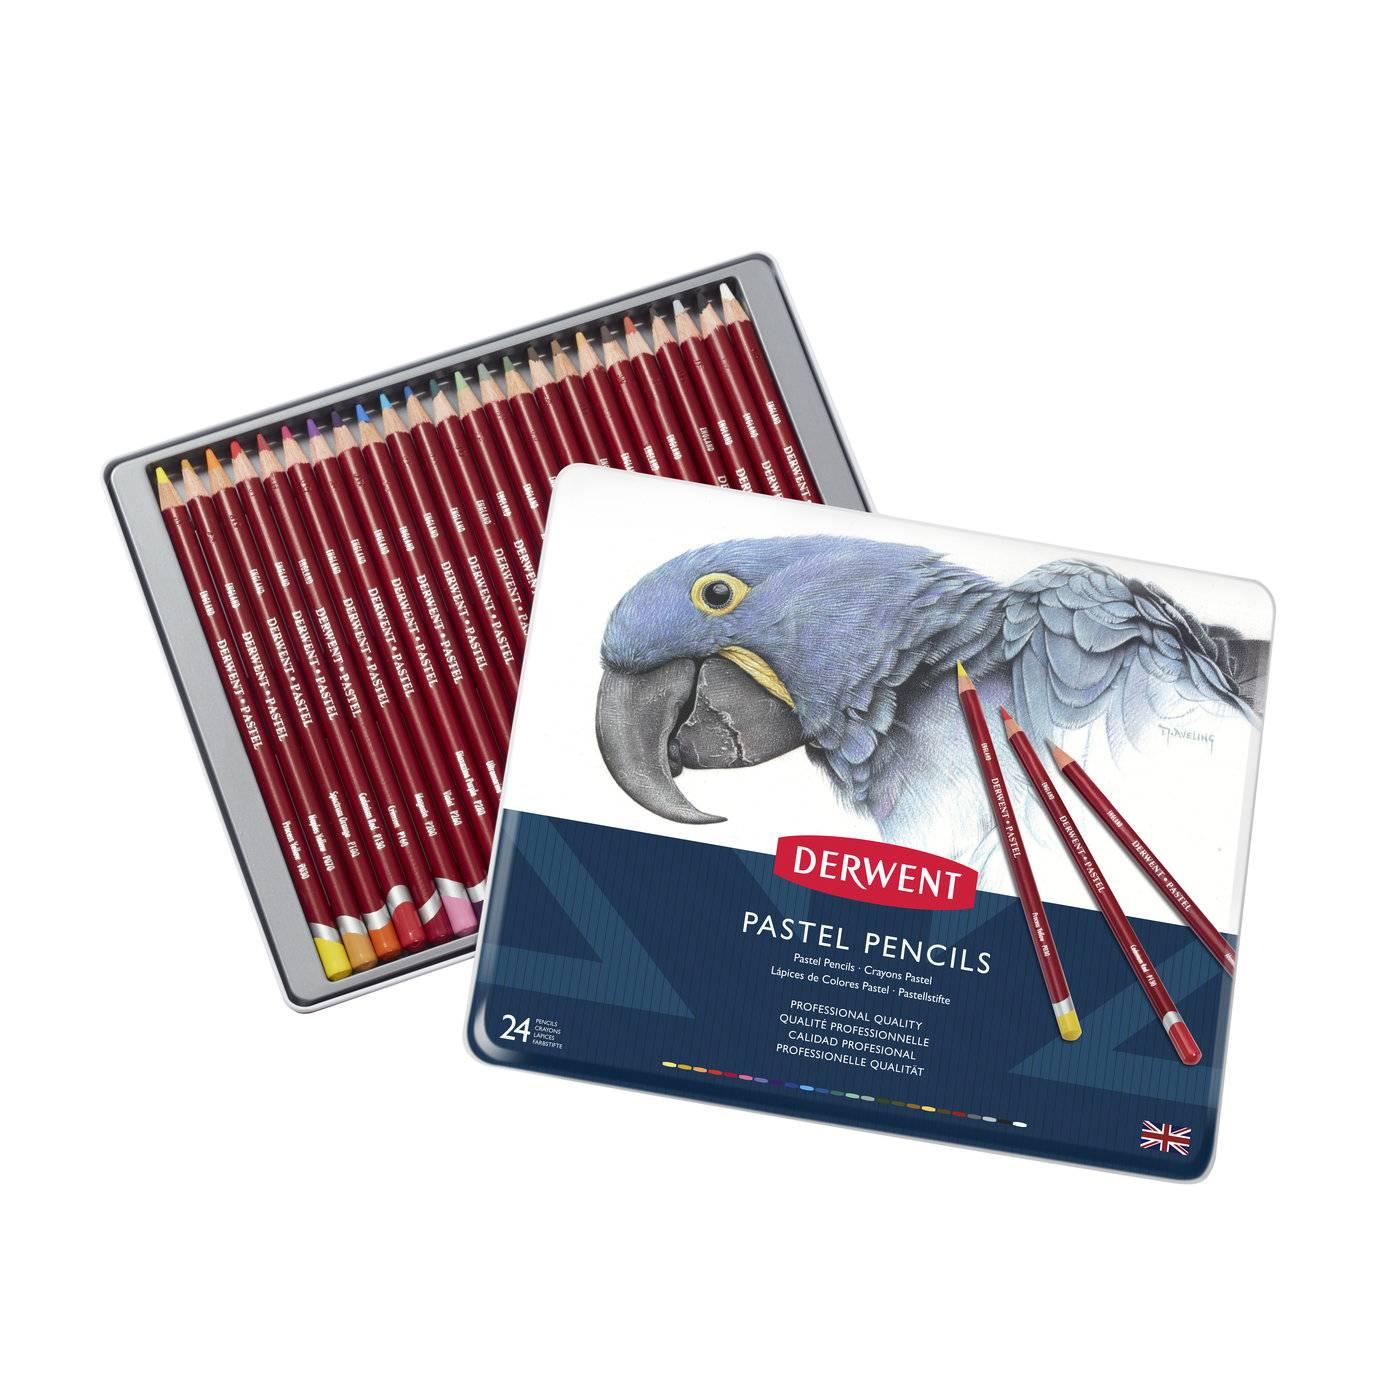 Derwent, Pastel pencils, 24 шт (32992)